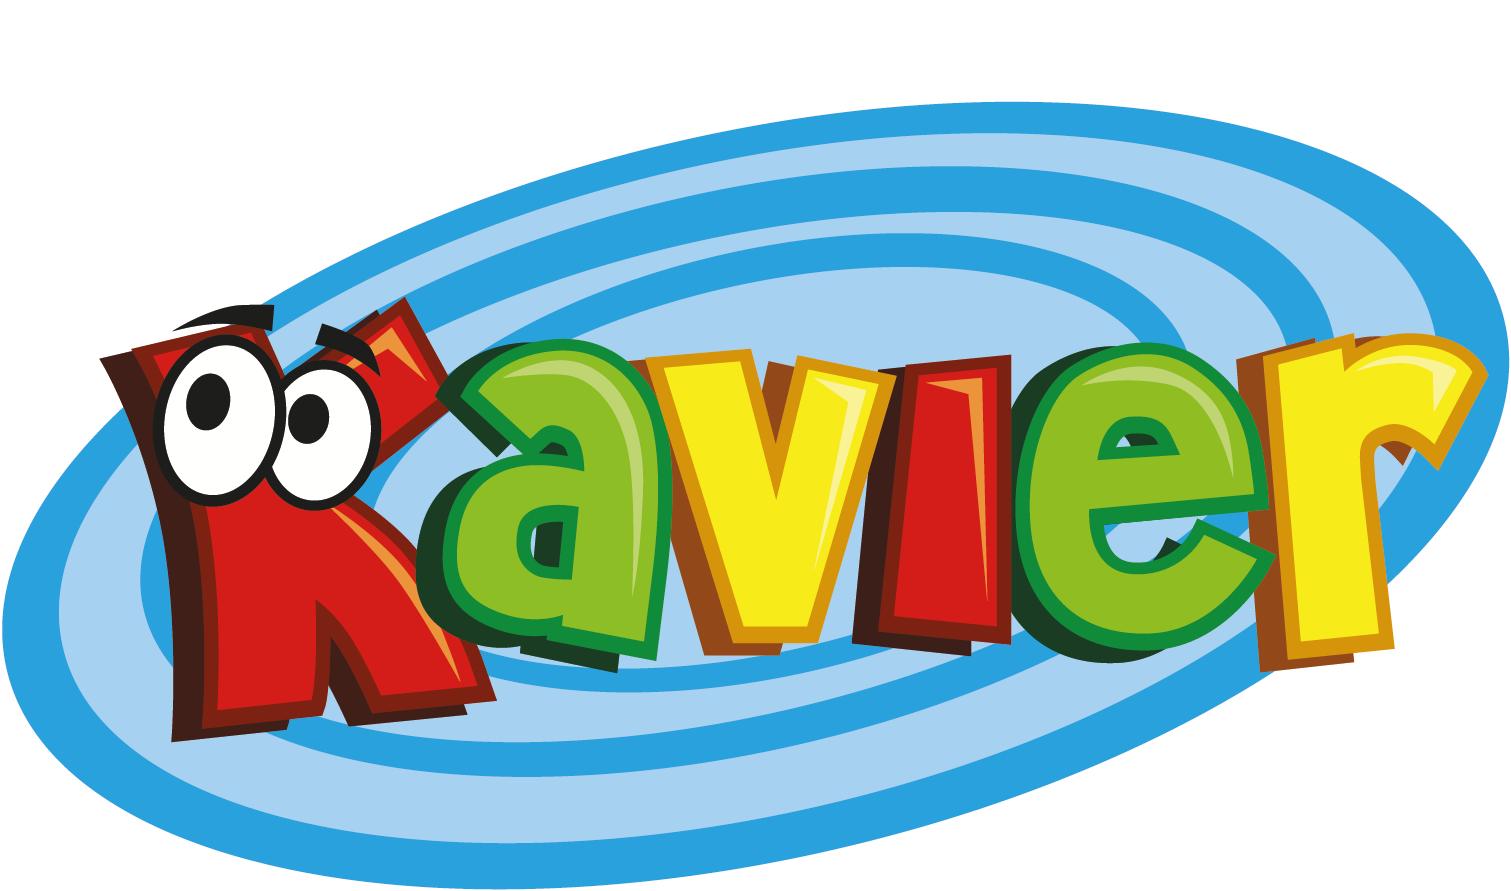 Diversiones Kavier